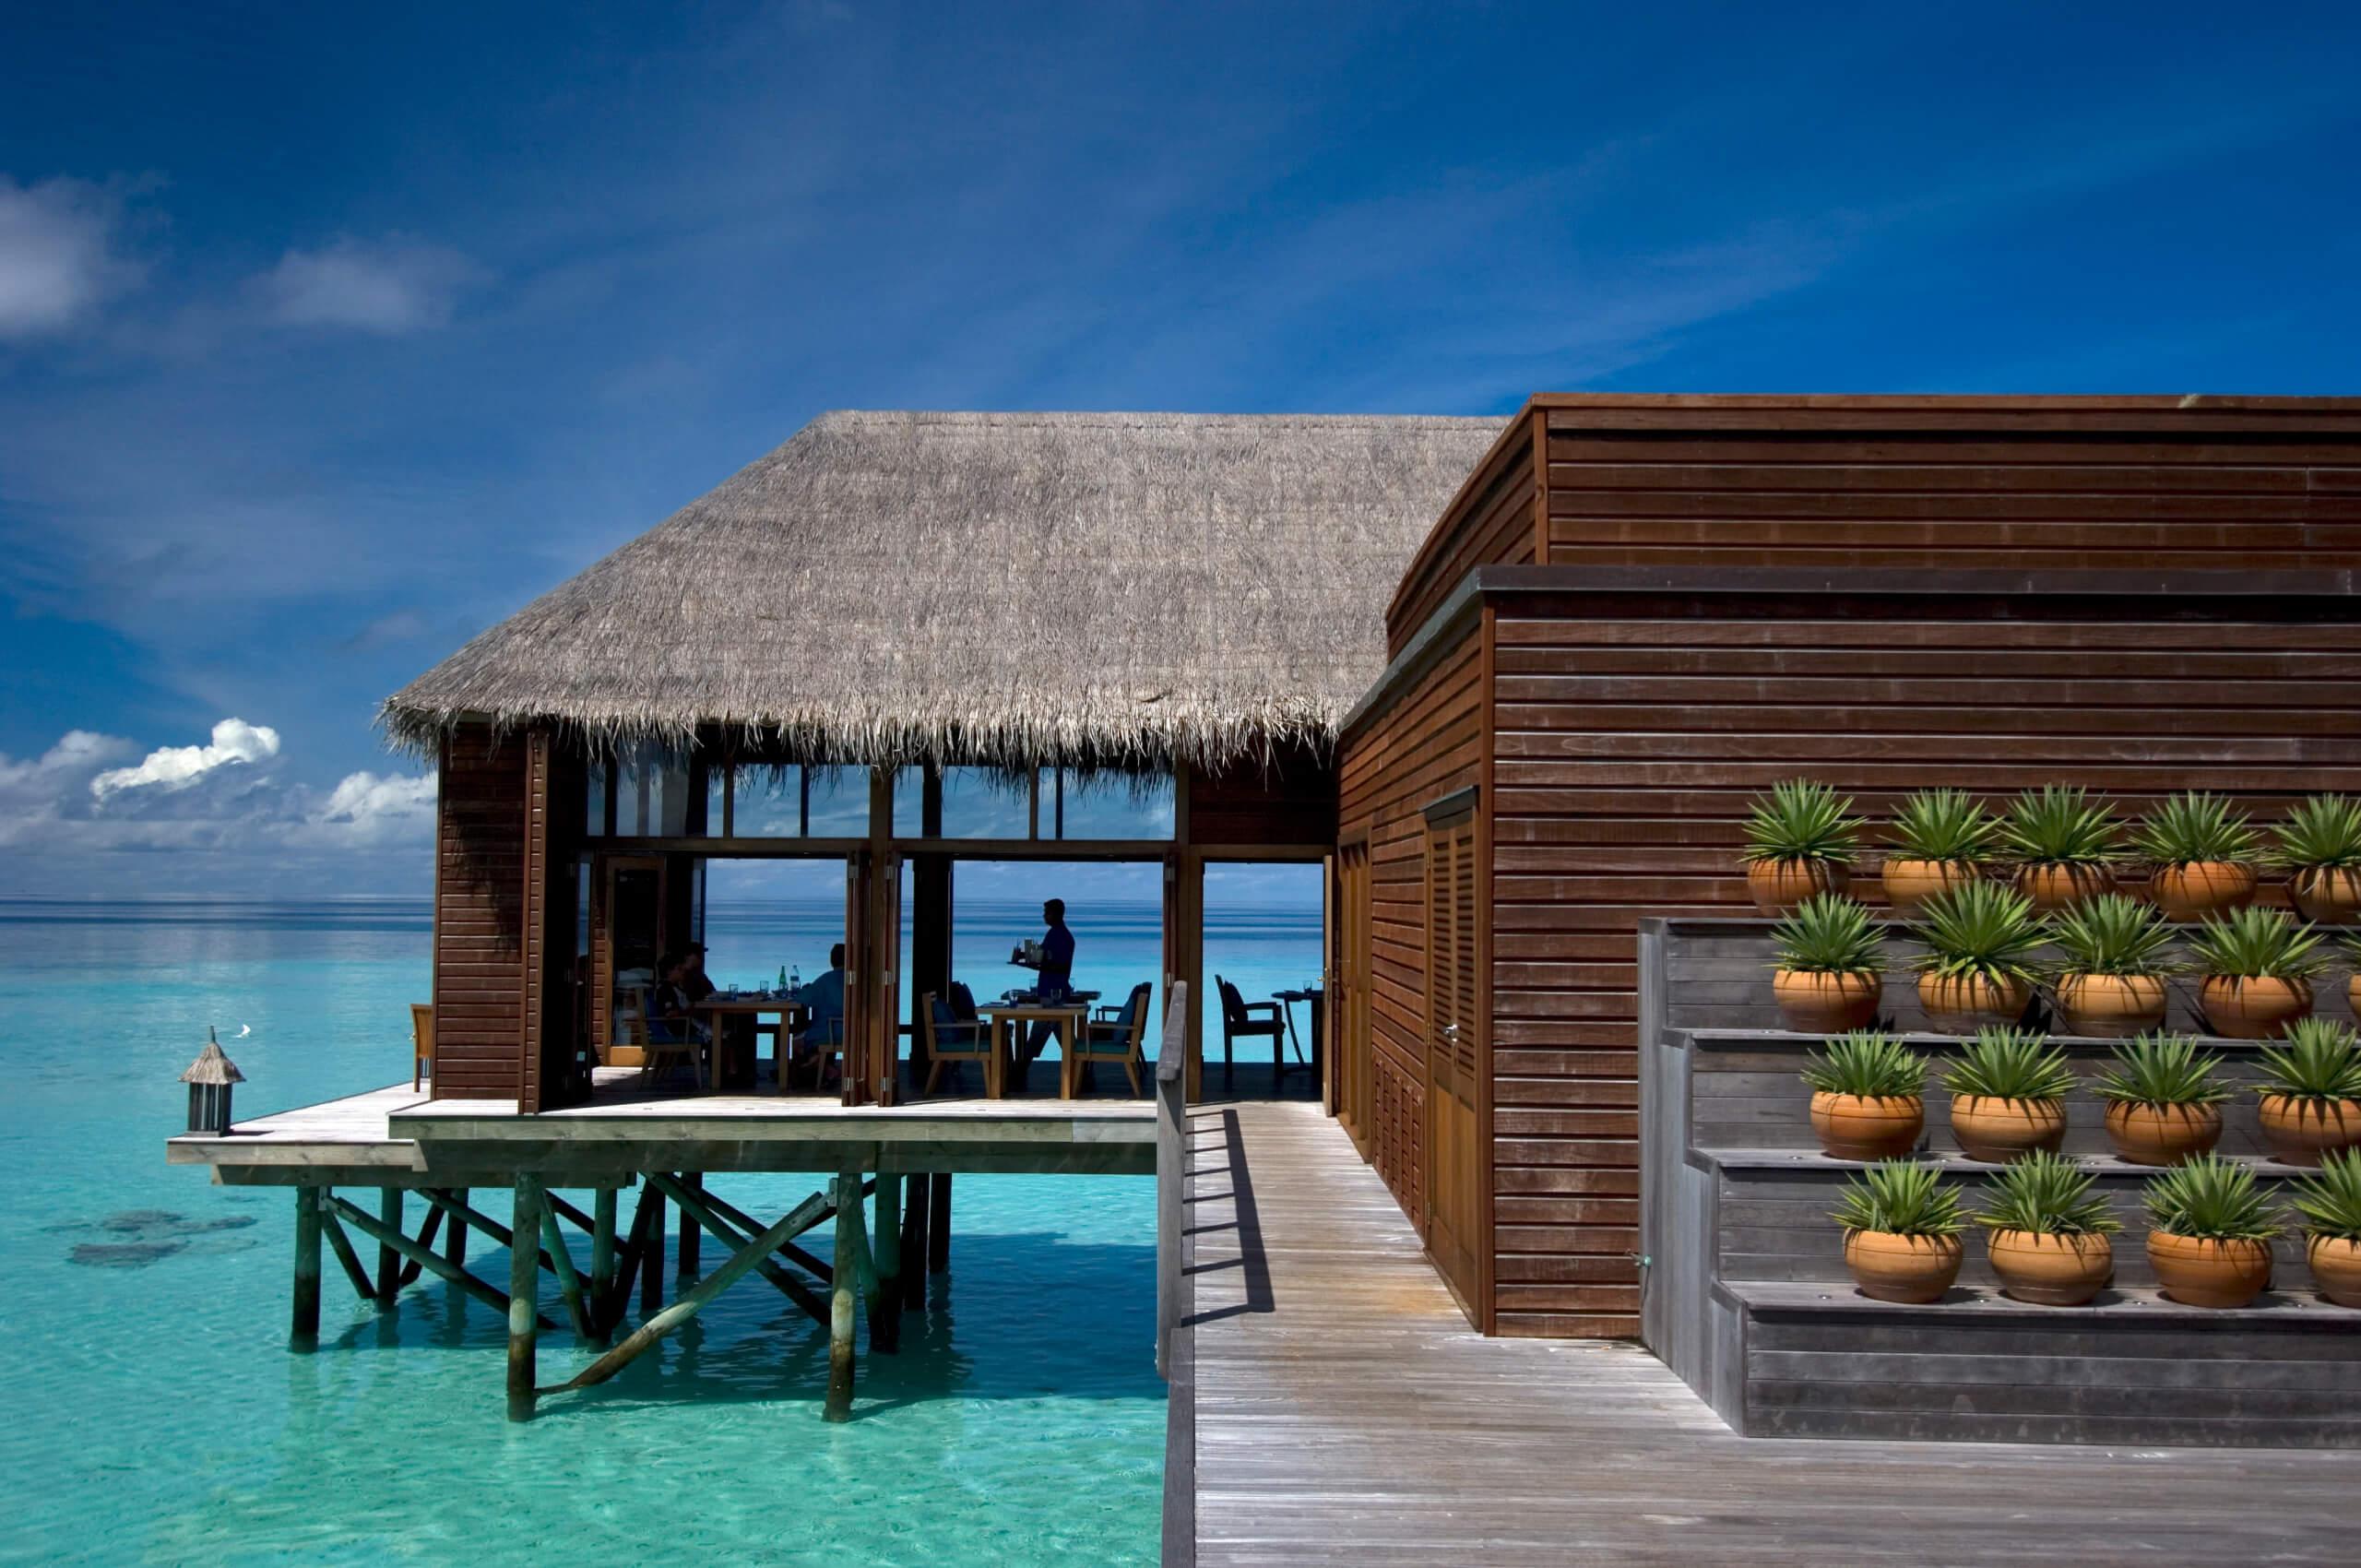 conrad rangali island, conrad maldives rangali island, conrad maldives rangali island price, 8. conrad maldives rangali island, conrad island, rangali island conrad, conrad rangali islands, conrad rangali island maldives, conrad maldives rangali island maldives, conrad island maldives, conrad maldives rangali island 5, conrad maldives rangali islands, conrad malediven rangali island, conrad maldives rangali island all inclusive, malediven conrad maldives rangali island, conrad maldives rangali island booking, the conrad maldives rangali island, maldives conrad rangali island, отель conrad maldives rangali island, conrad maldives rangali island buchen, conrad maldives rangali island holidays…